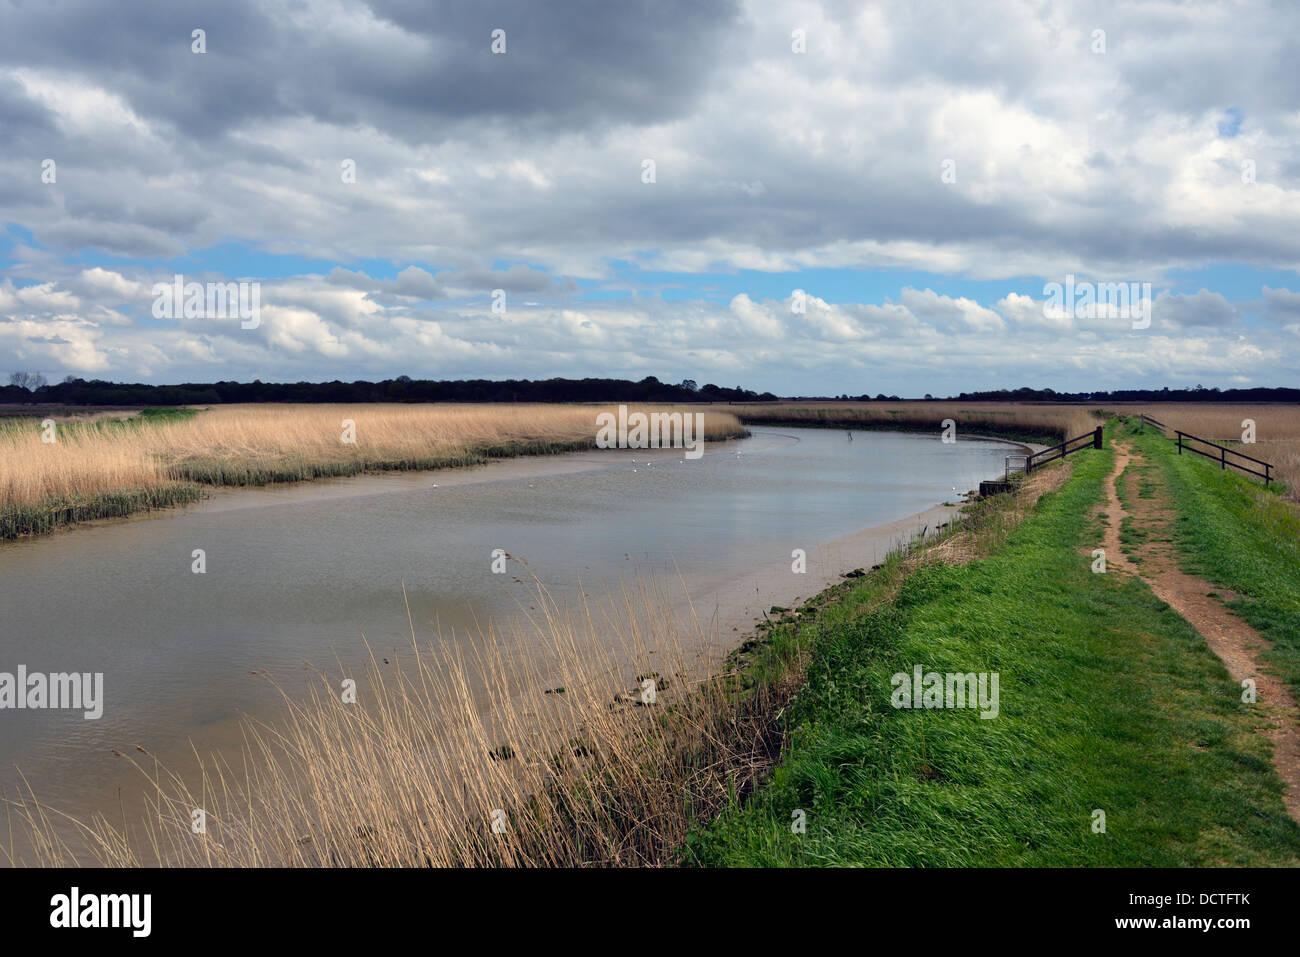 the-river-alde-at-snape-maltings-suffolk-england-united-kingdom-europe-DCTFTK.jpg